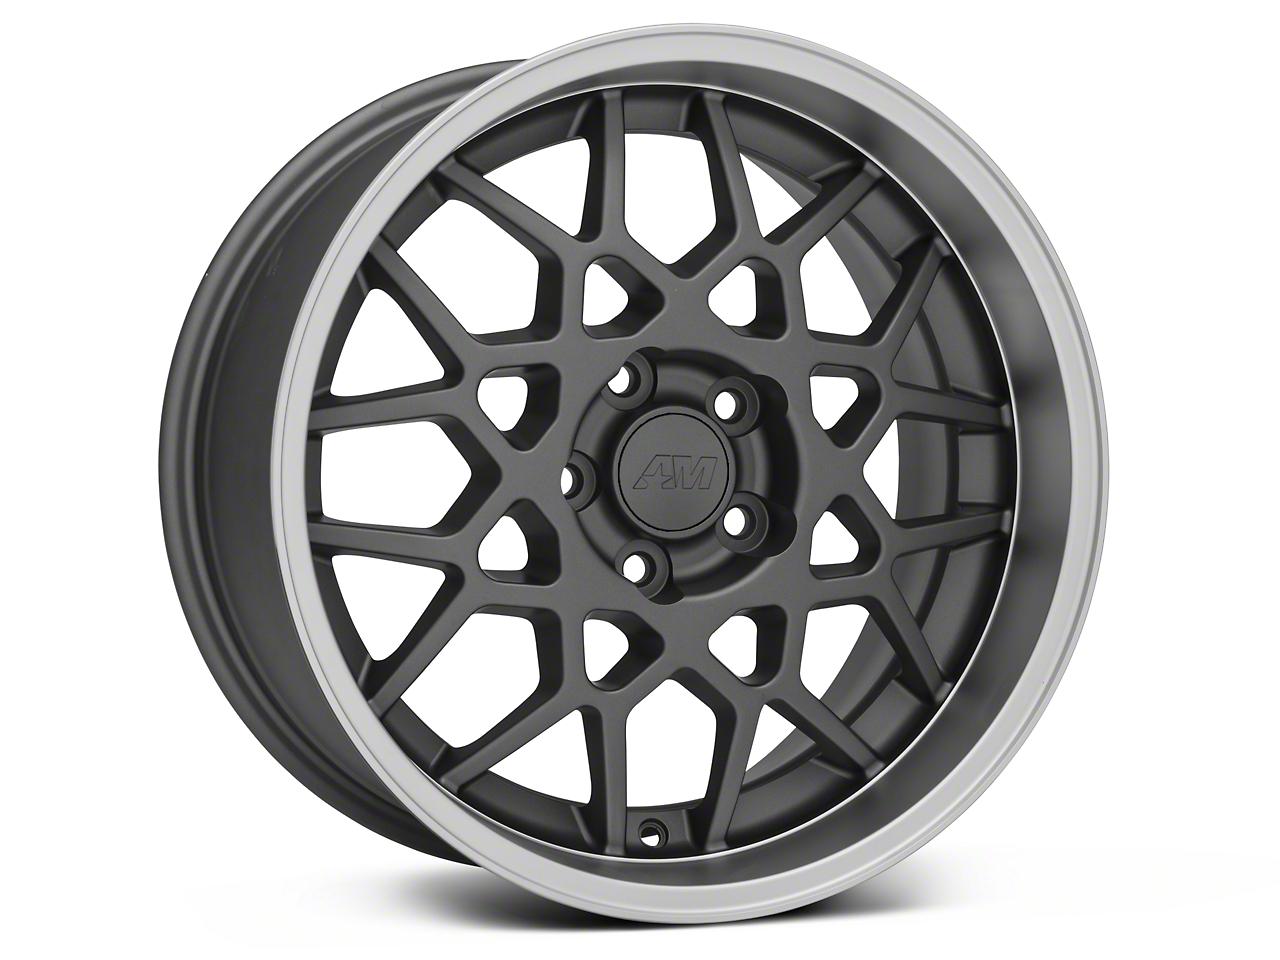 2013 GT500 Style Deep Dish Charcoal Wheel - 18x9 (05-09 GT, V6)